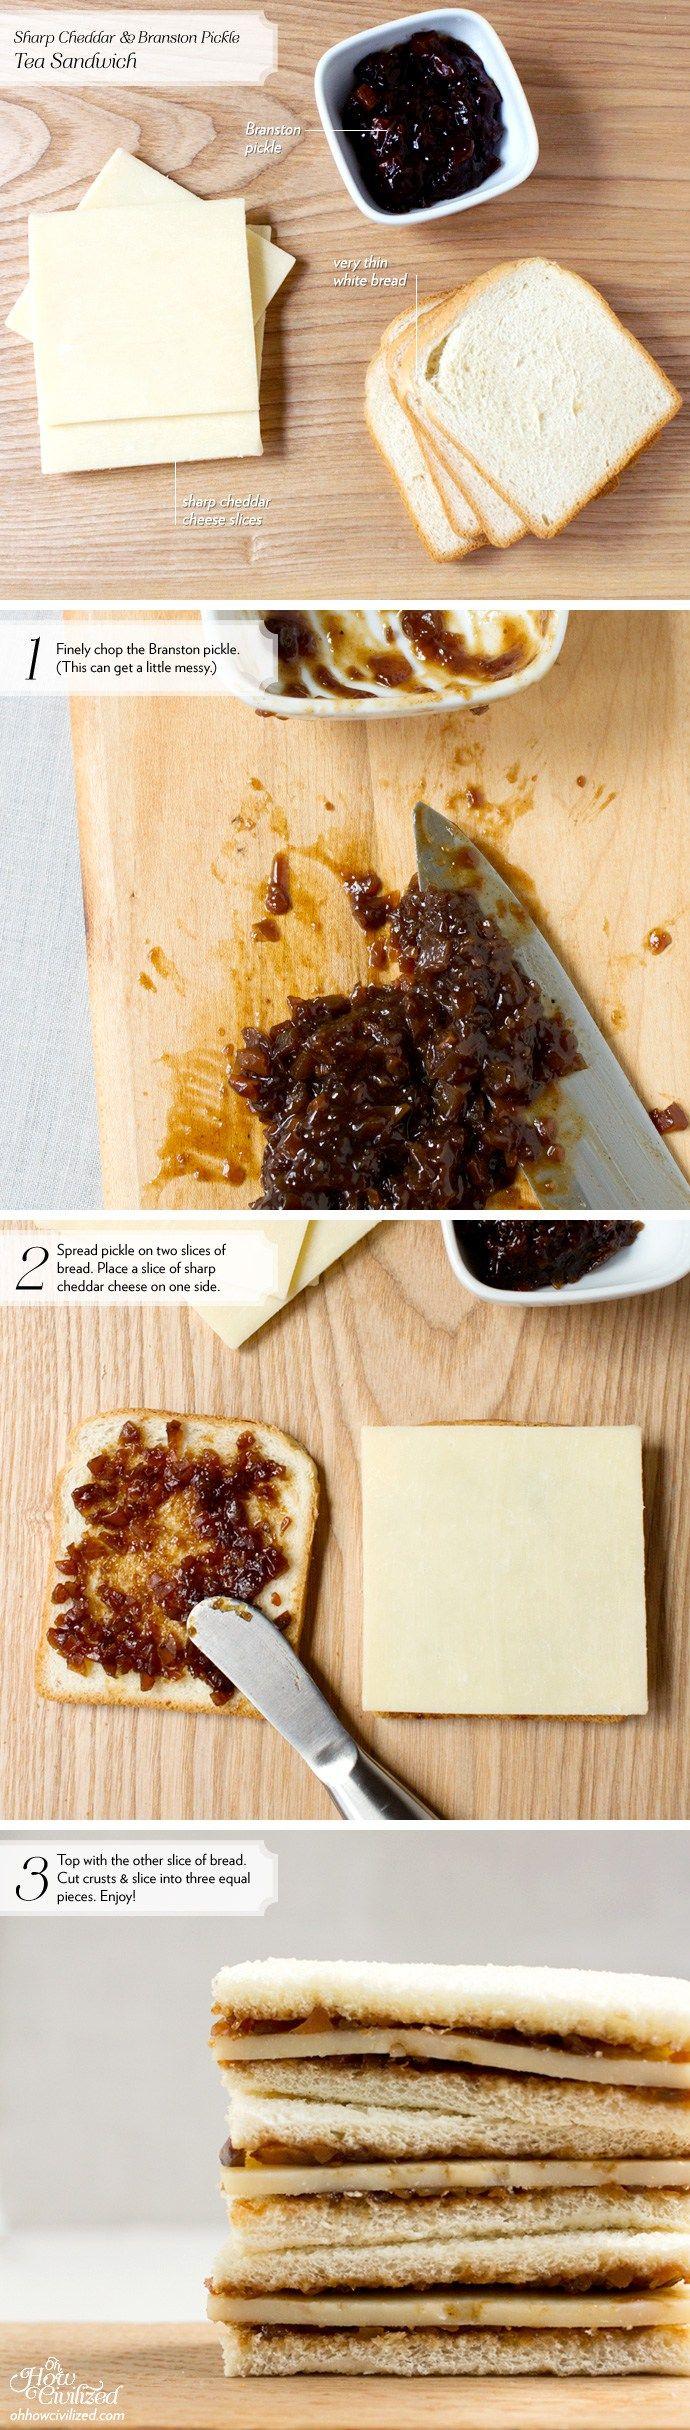 0713_tea_sandwich_cheddar_branston_pickle